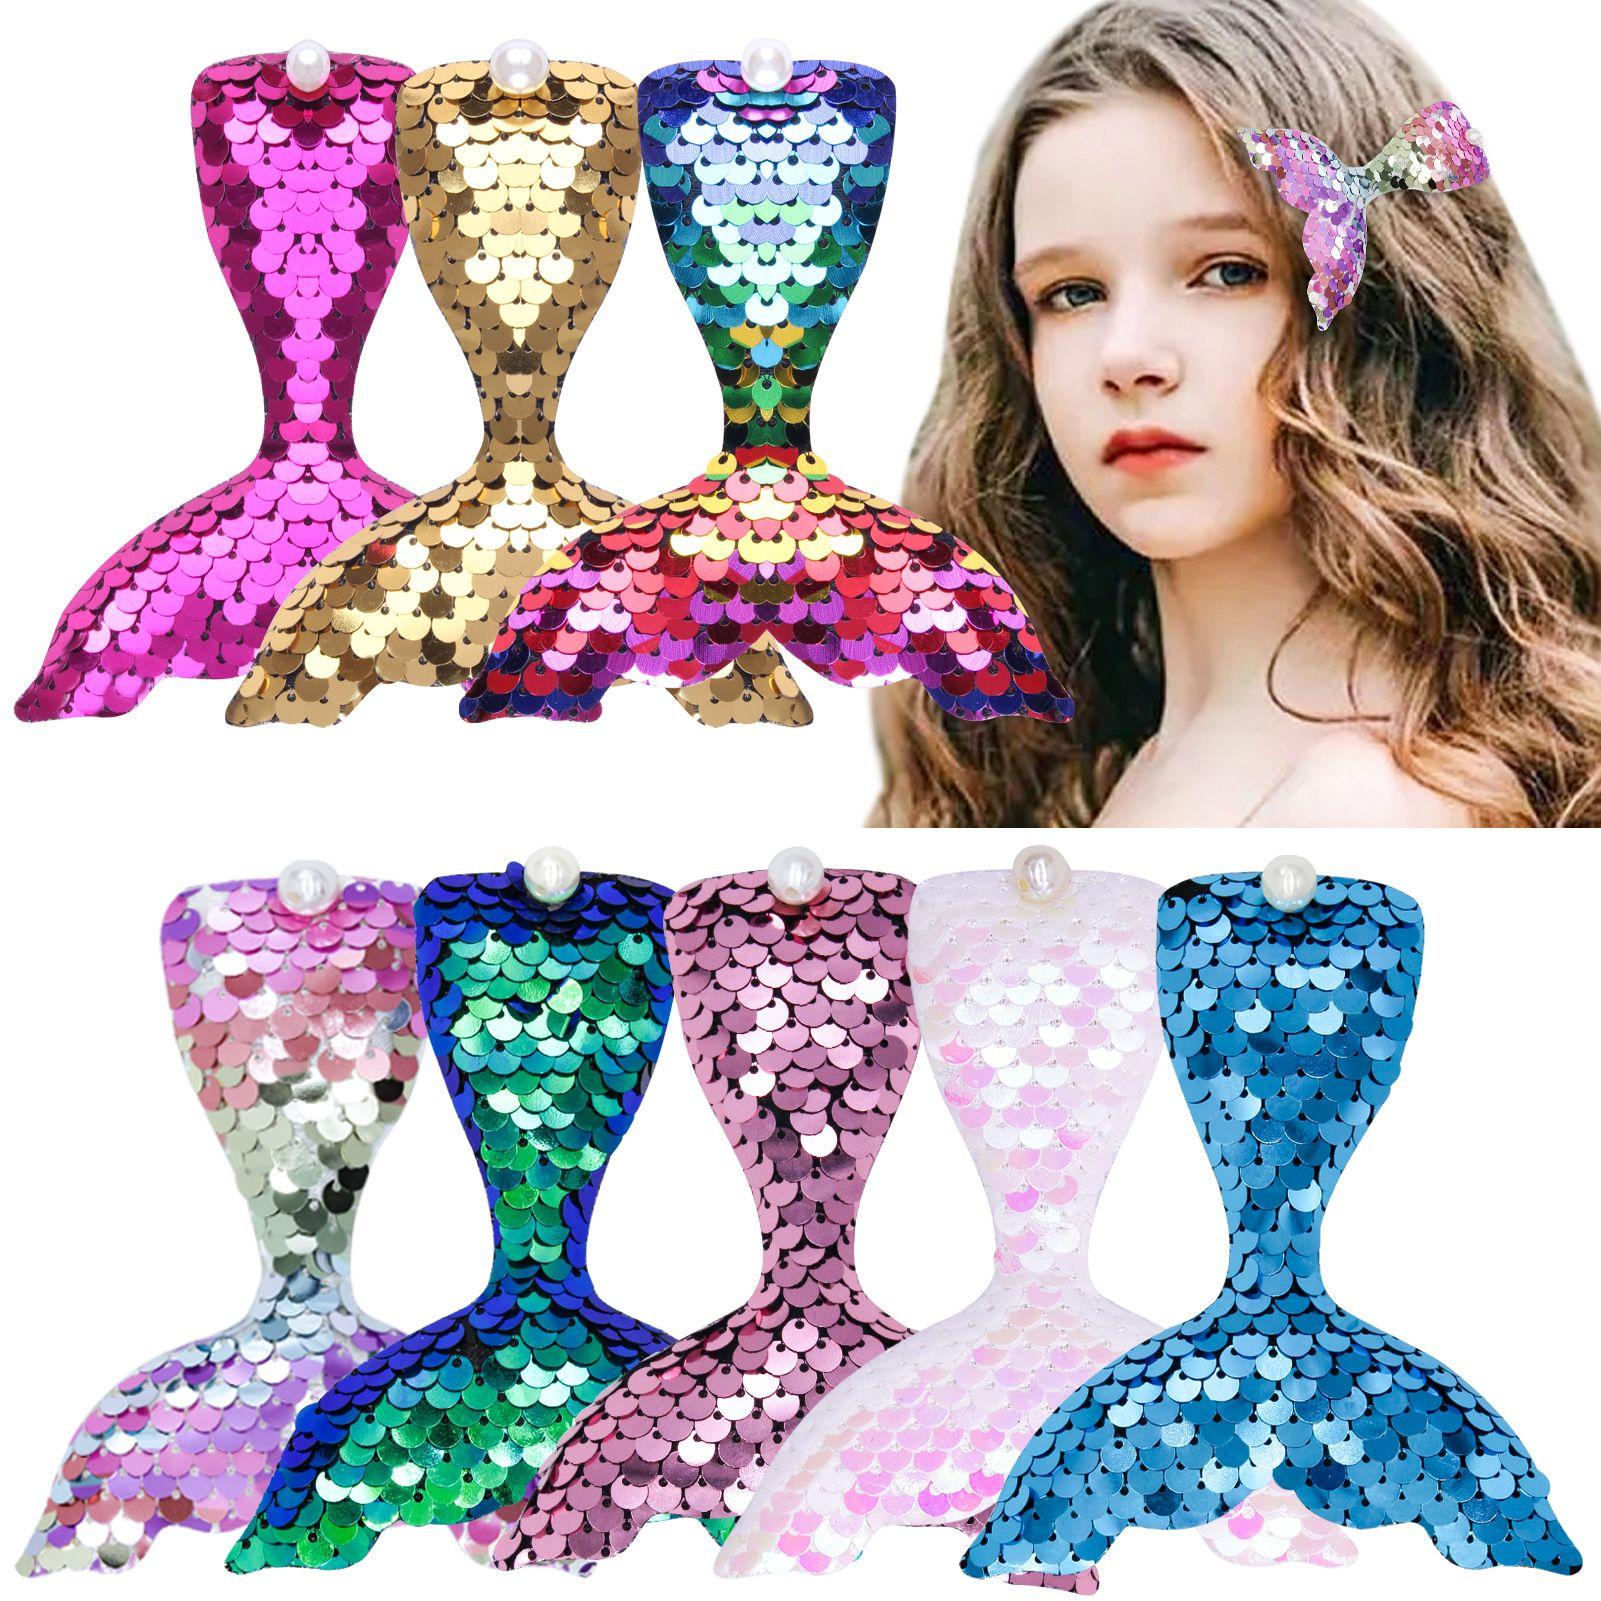 Glitter Sequins Mermaid Tail Hair Clips Beautiful Pearl fish tails Hairpins Cute Trendy Headwear for Girls DIY Hair Accessories